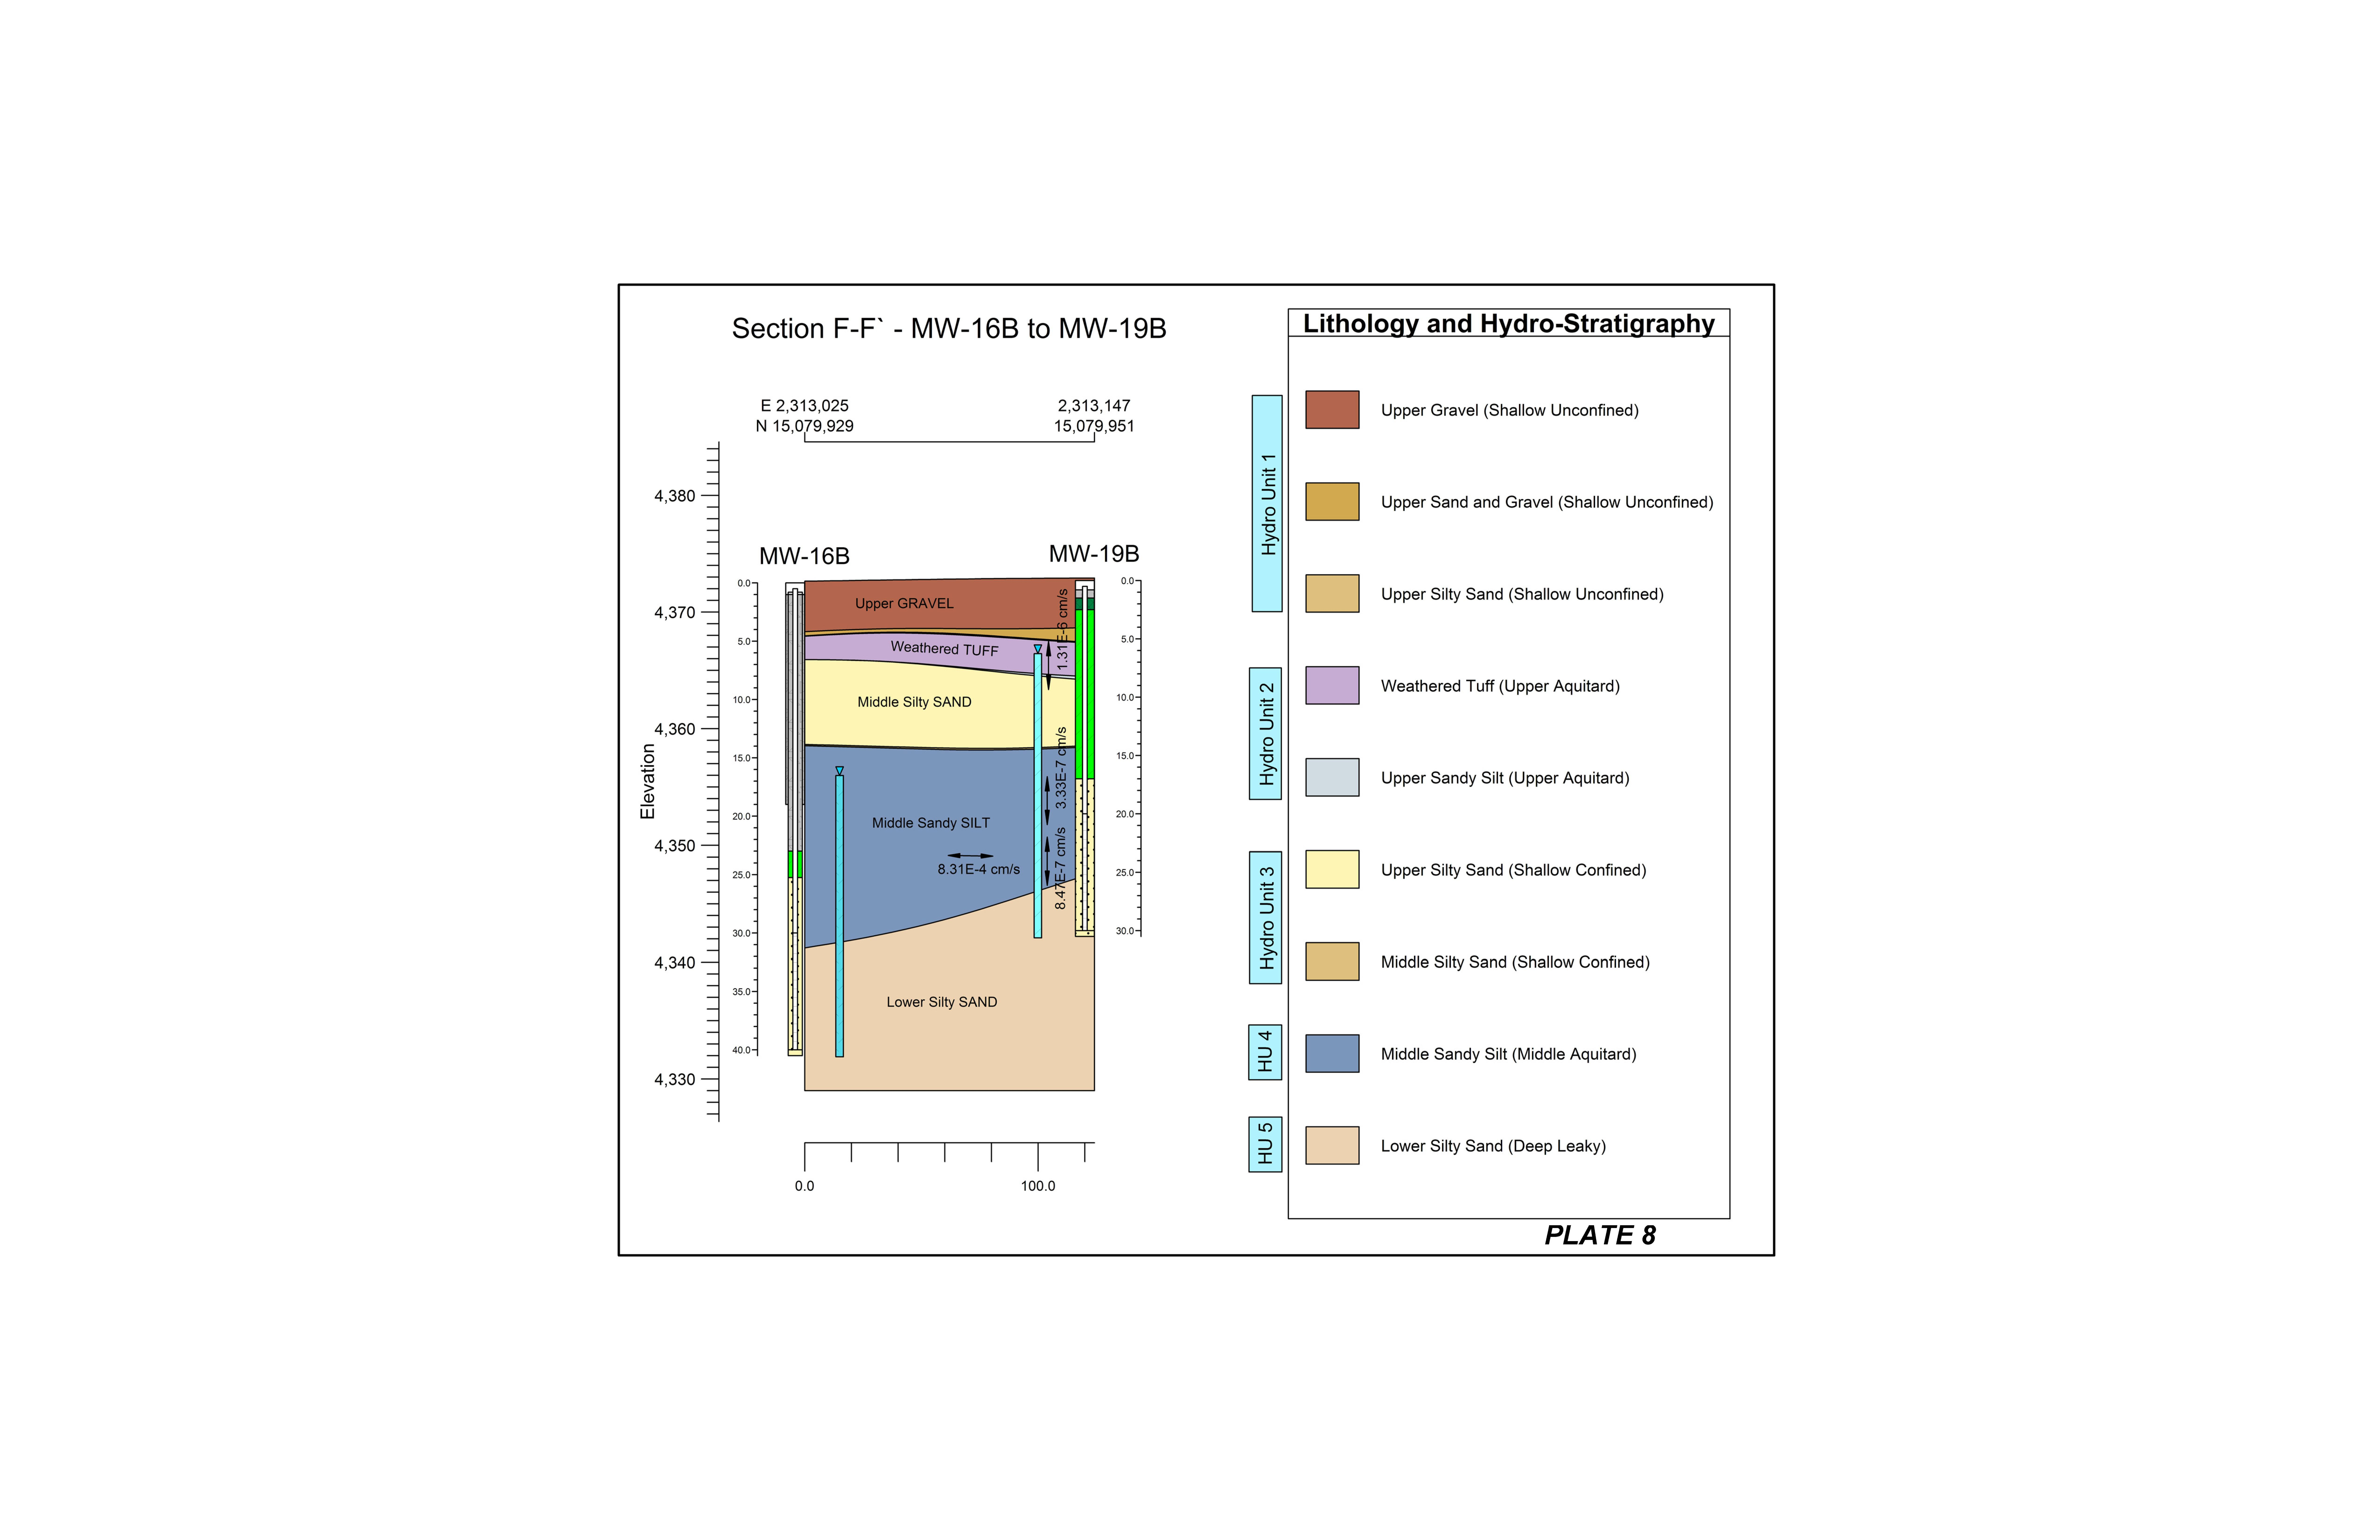 plate-8-hydro-stratagraphic_section_f-f_mw-16b-mw-19b